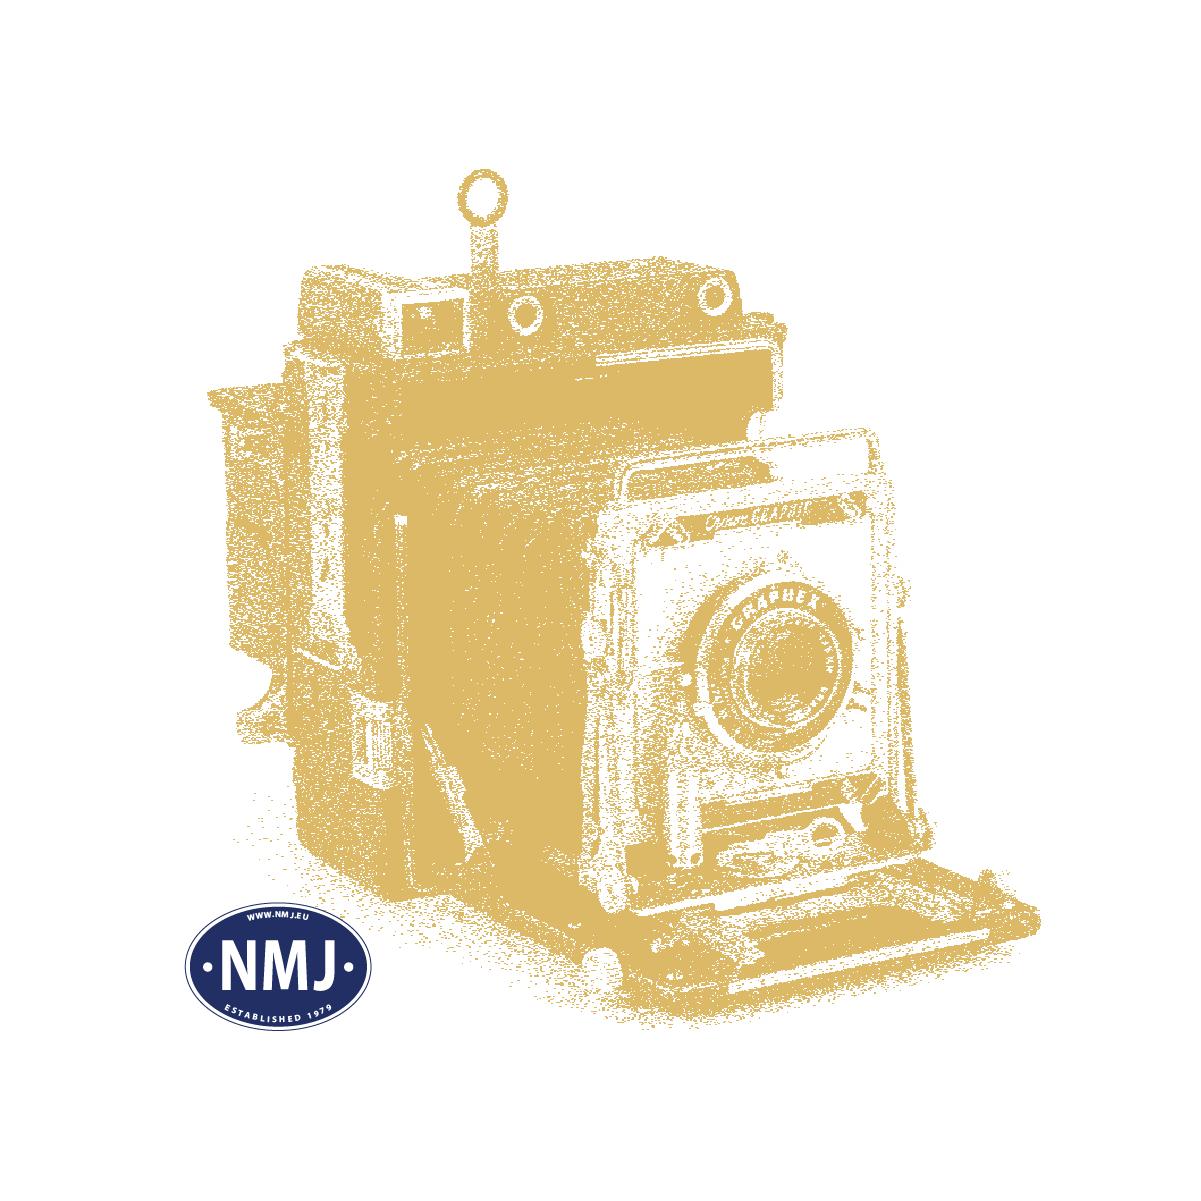 NMJT90104 - NMJ Topline DSB MY 1135, Nohab, DC